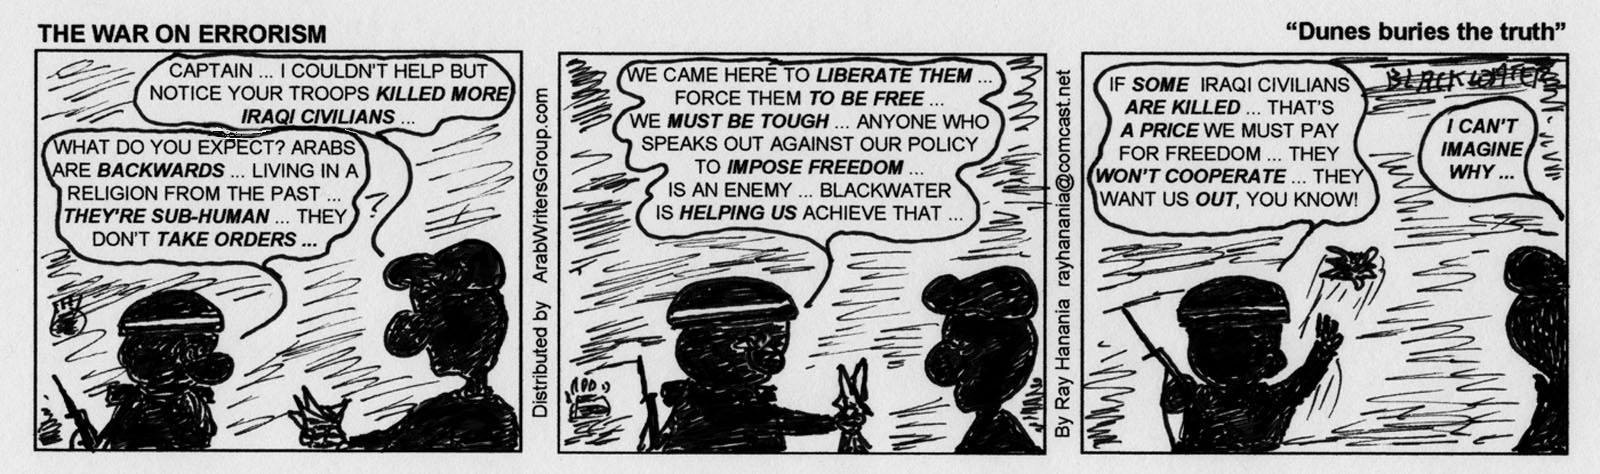 War on Errorism Cartoon Dunes Buries Lies in Iraq10-02-07